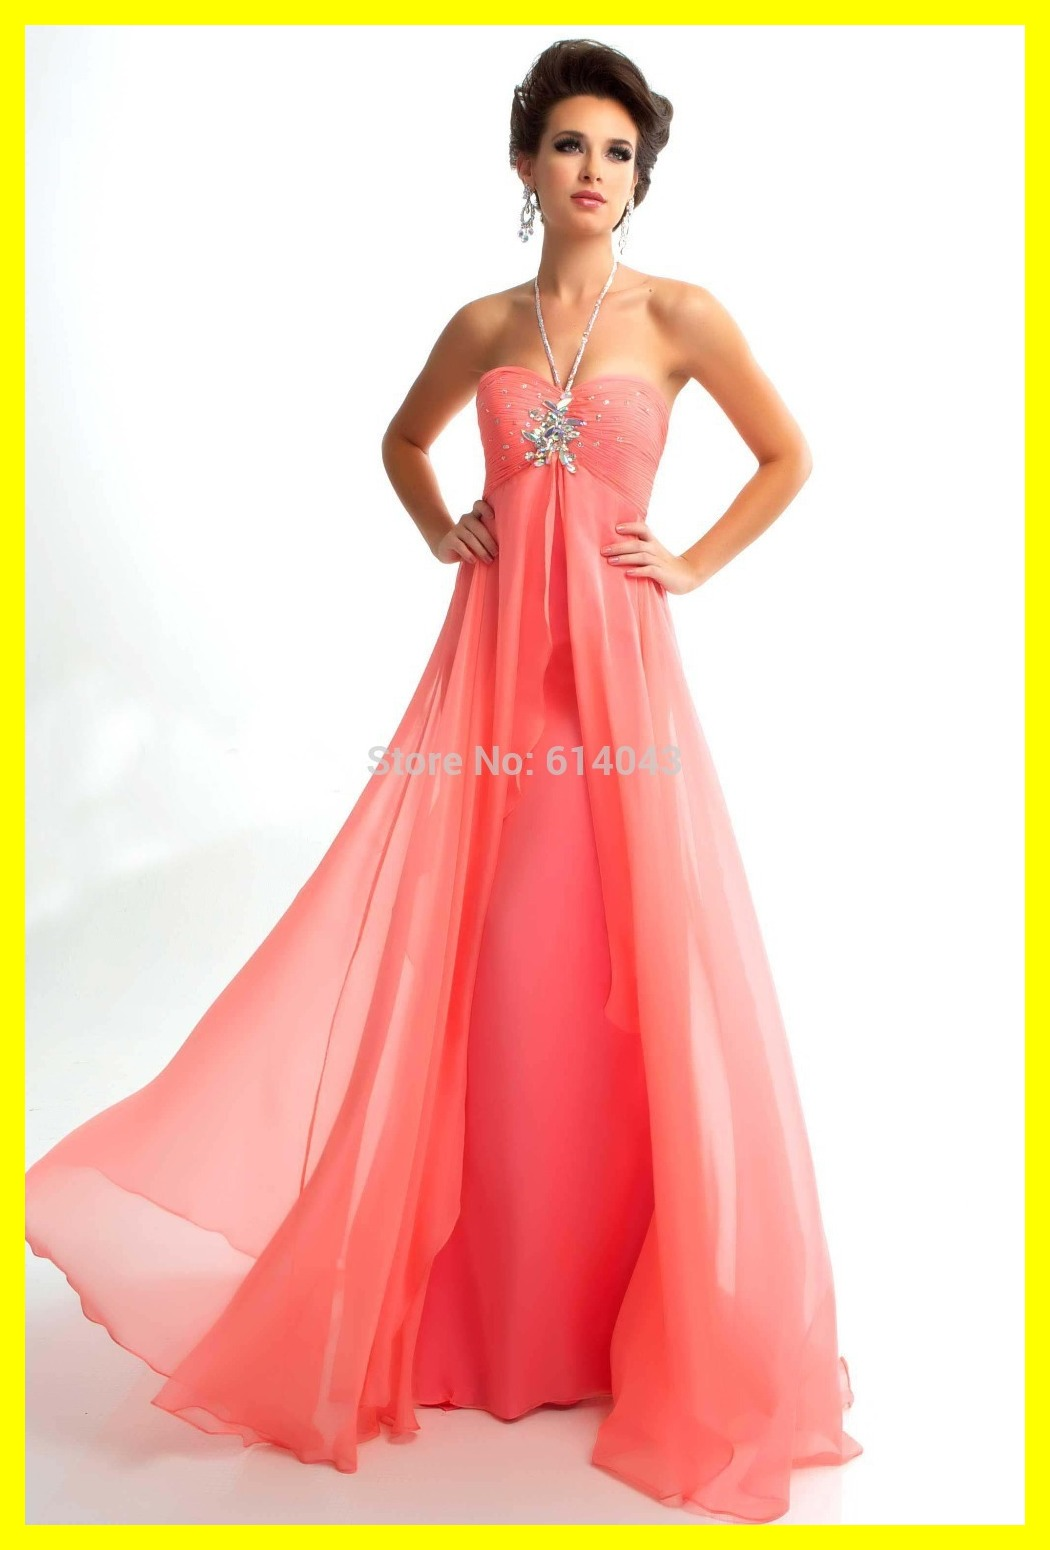 Online Shop Indie Prom Dresses Dress Stores In Atlanta Ivory Plus ...